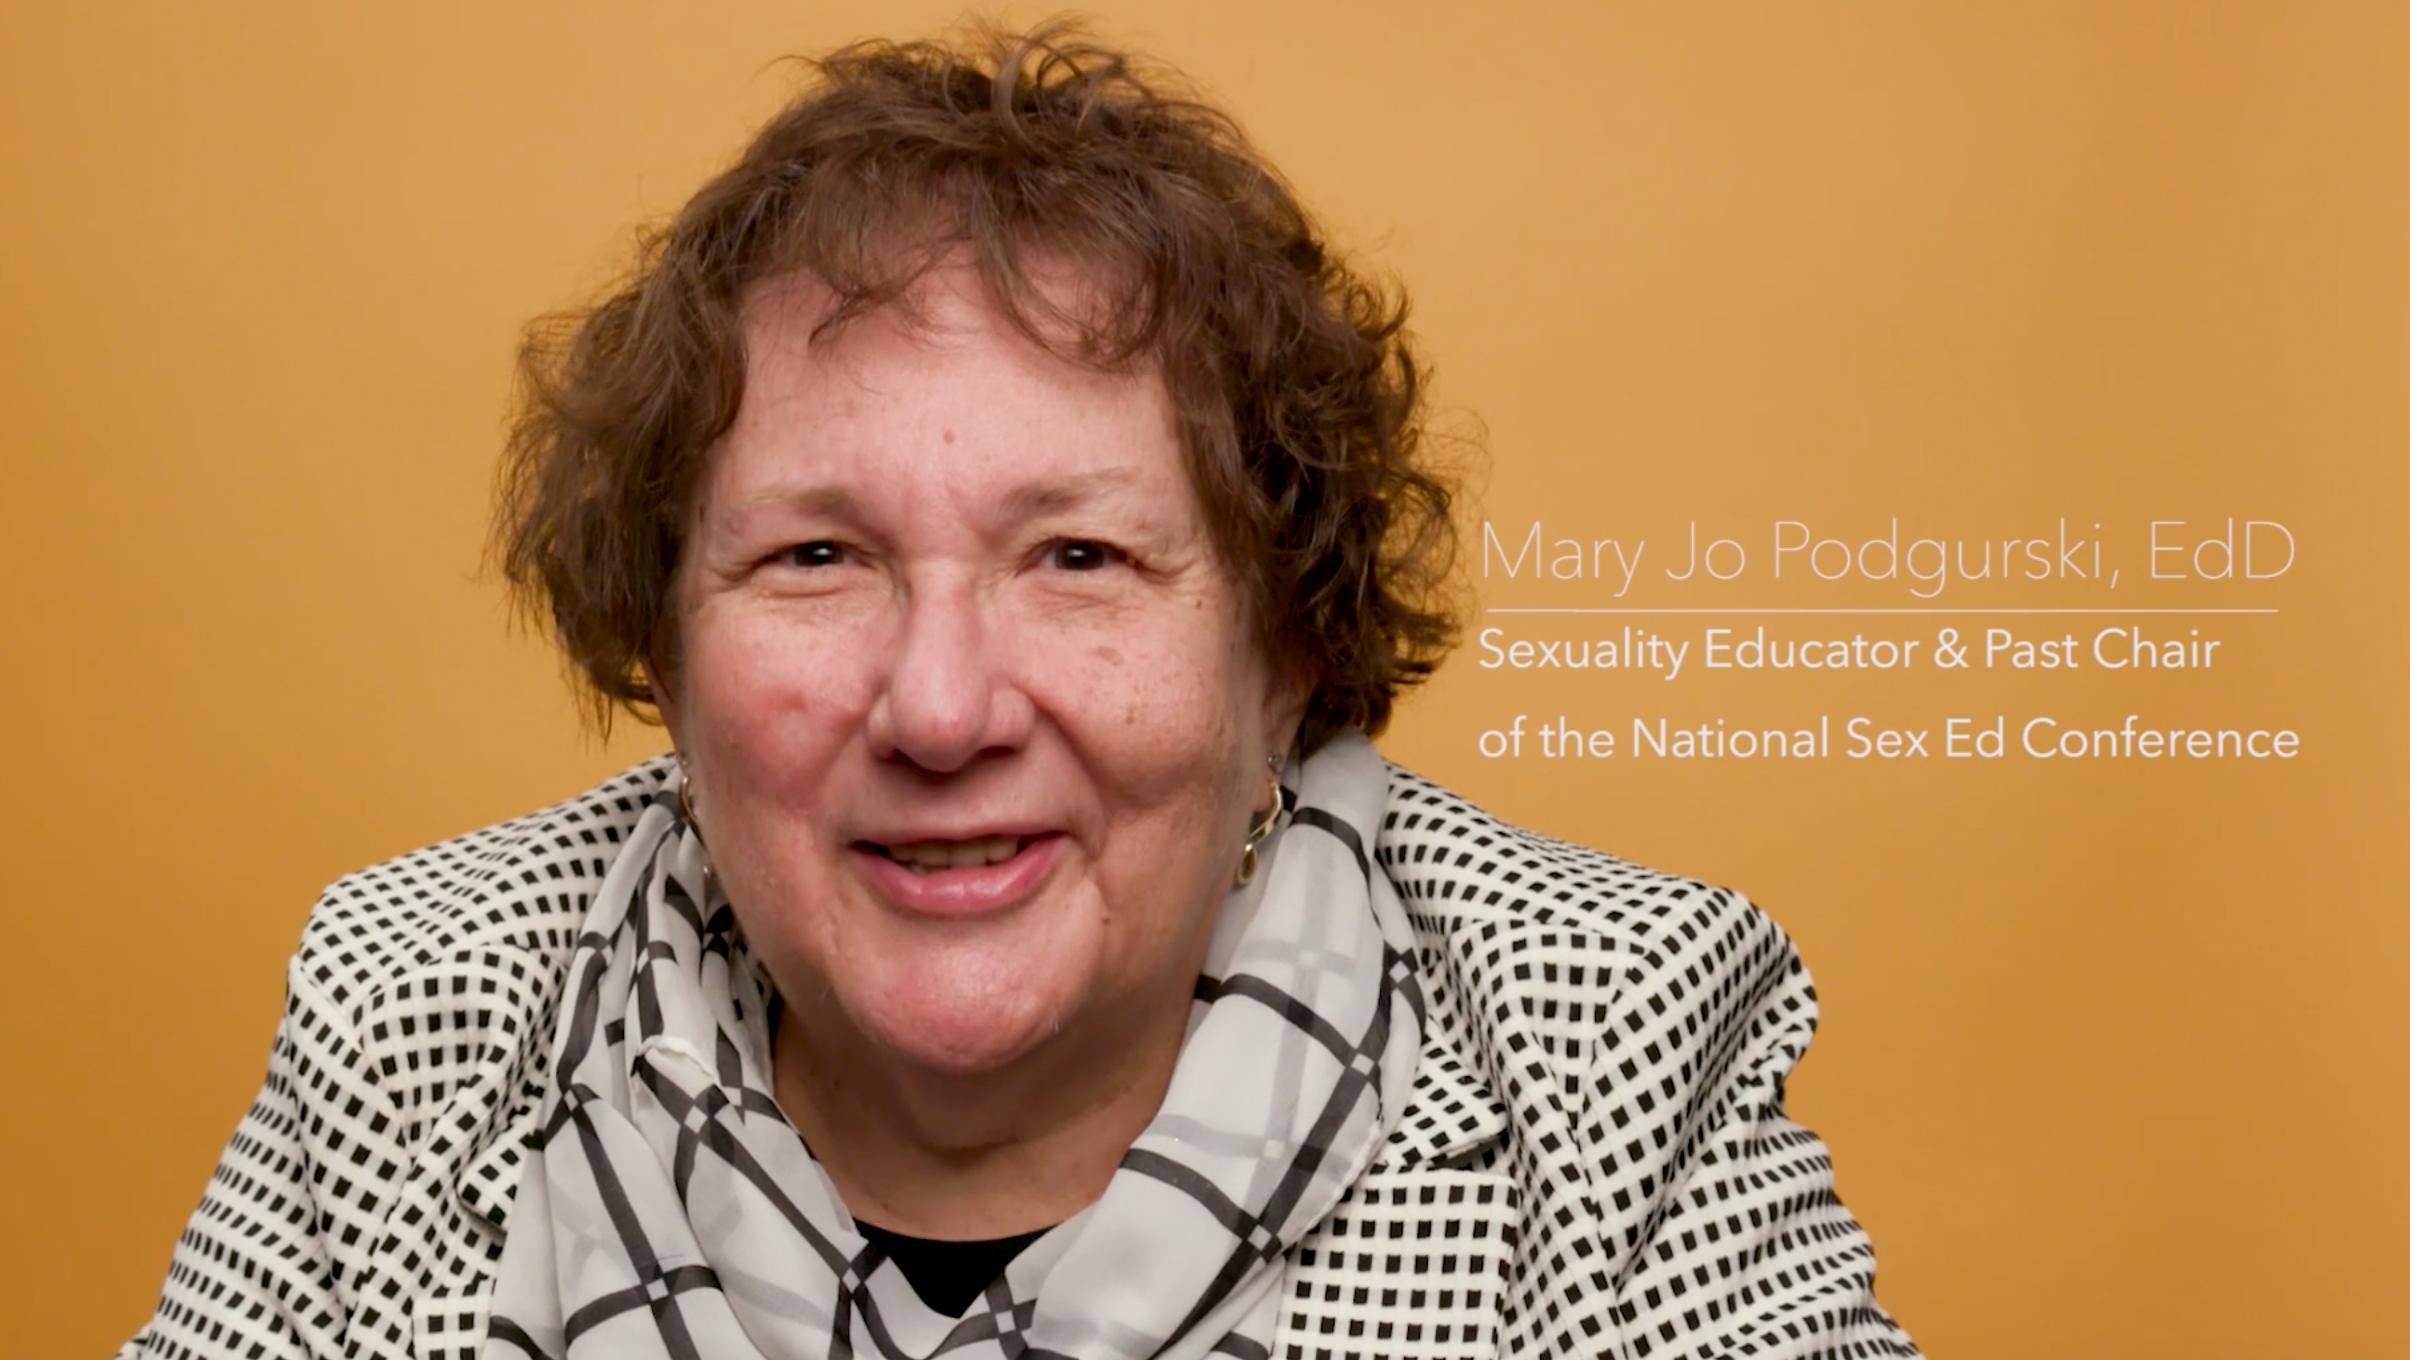 Sex educator